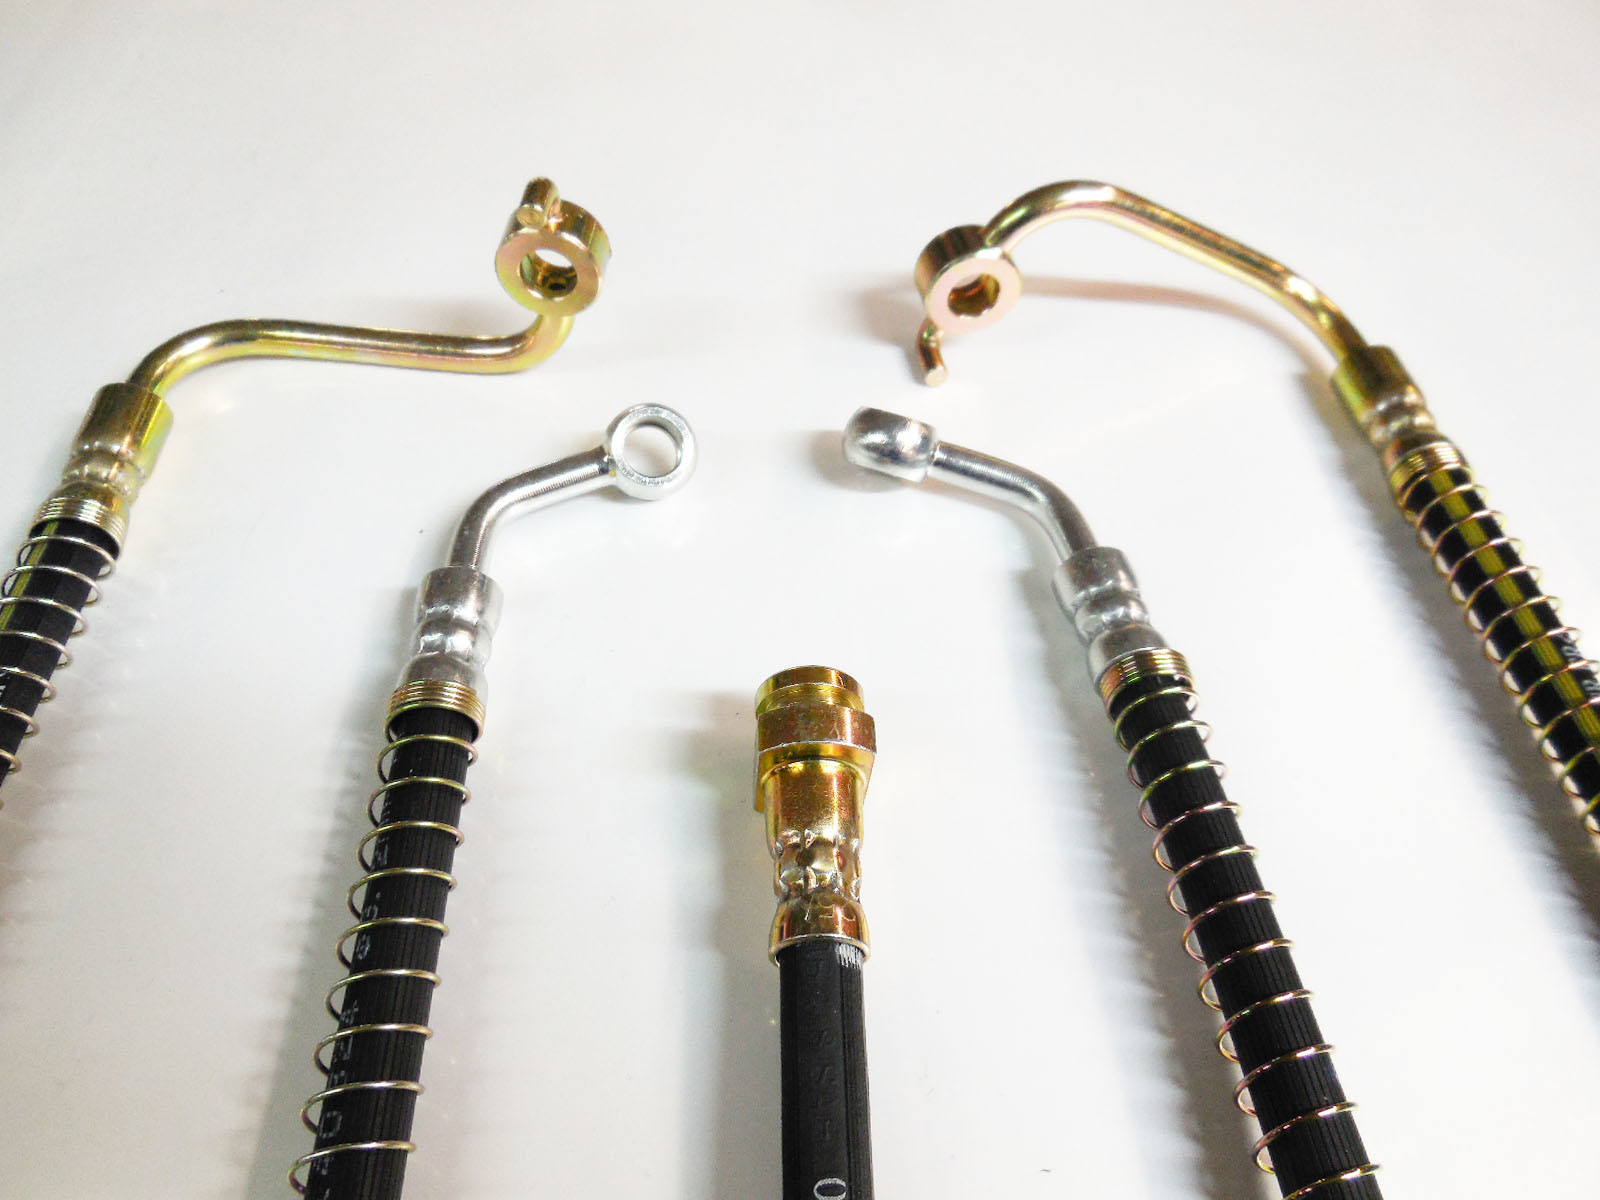 SAE J1401 Hydraulic Brake Hose Assembly